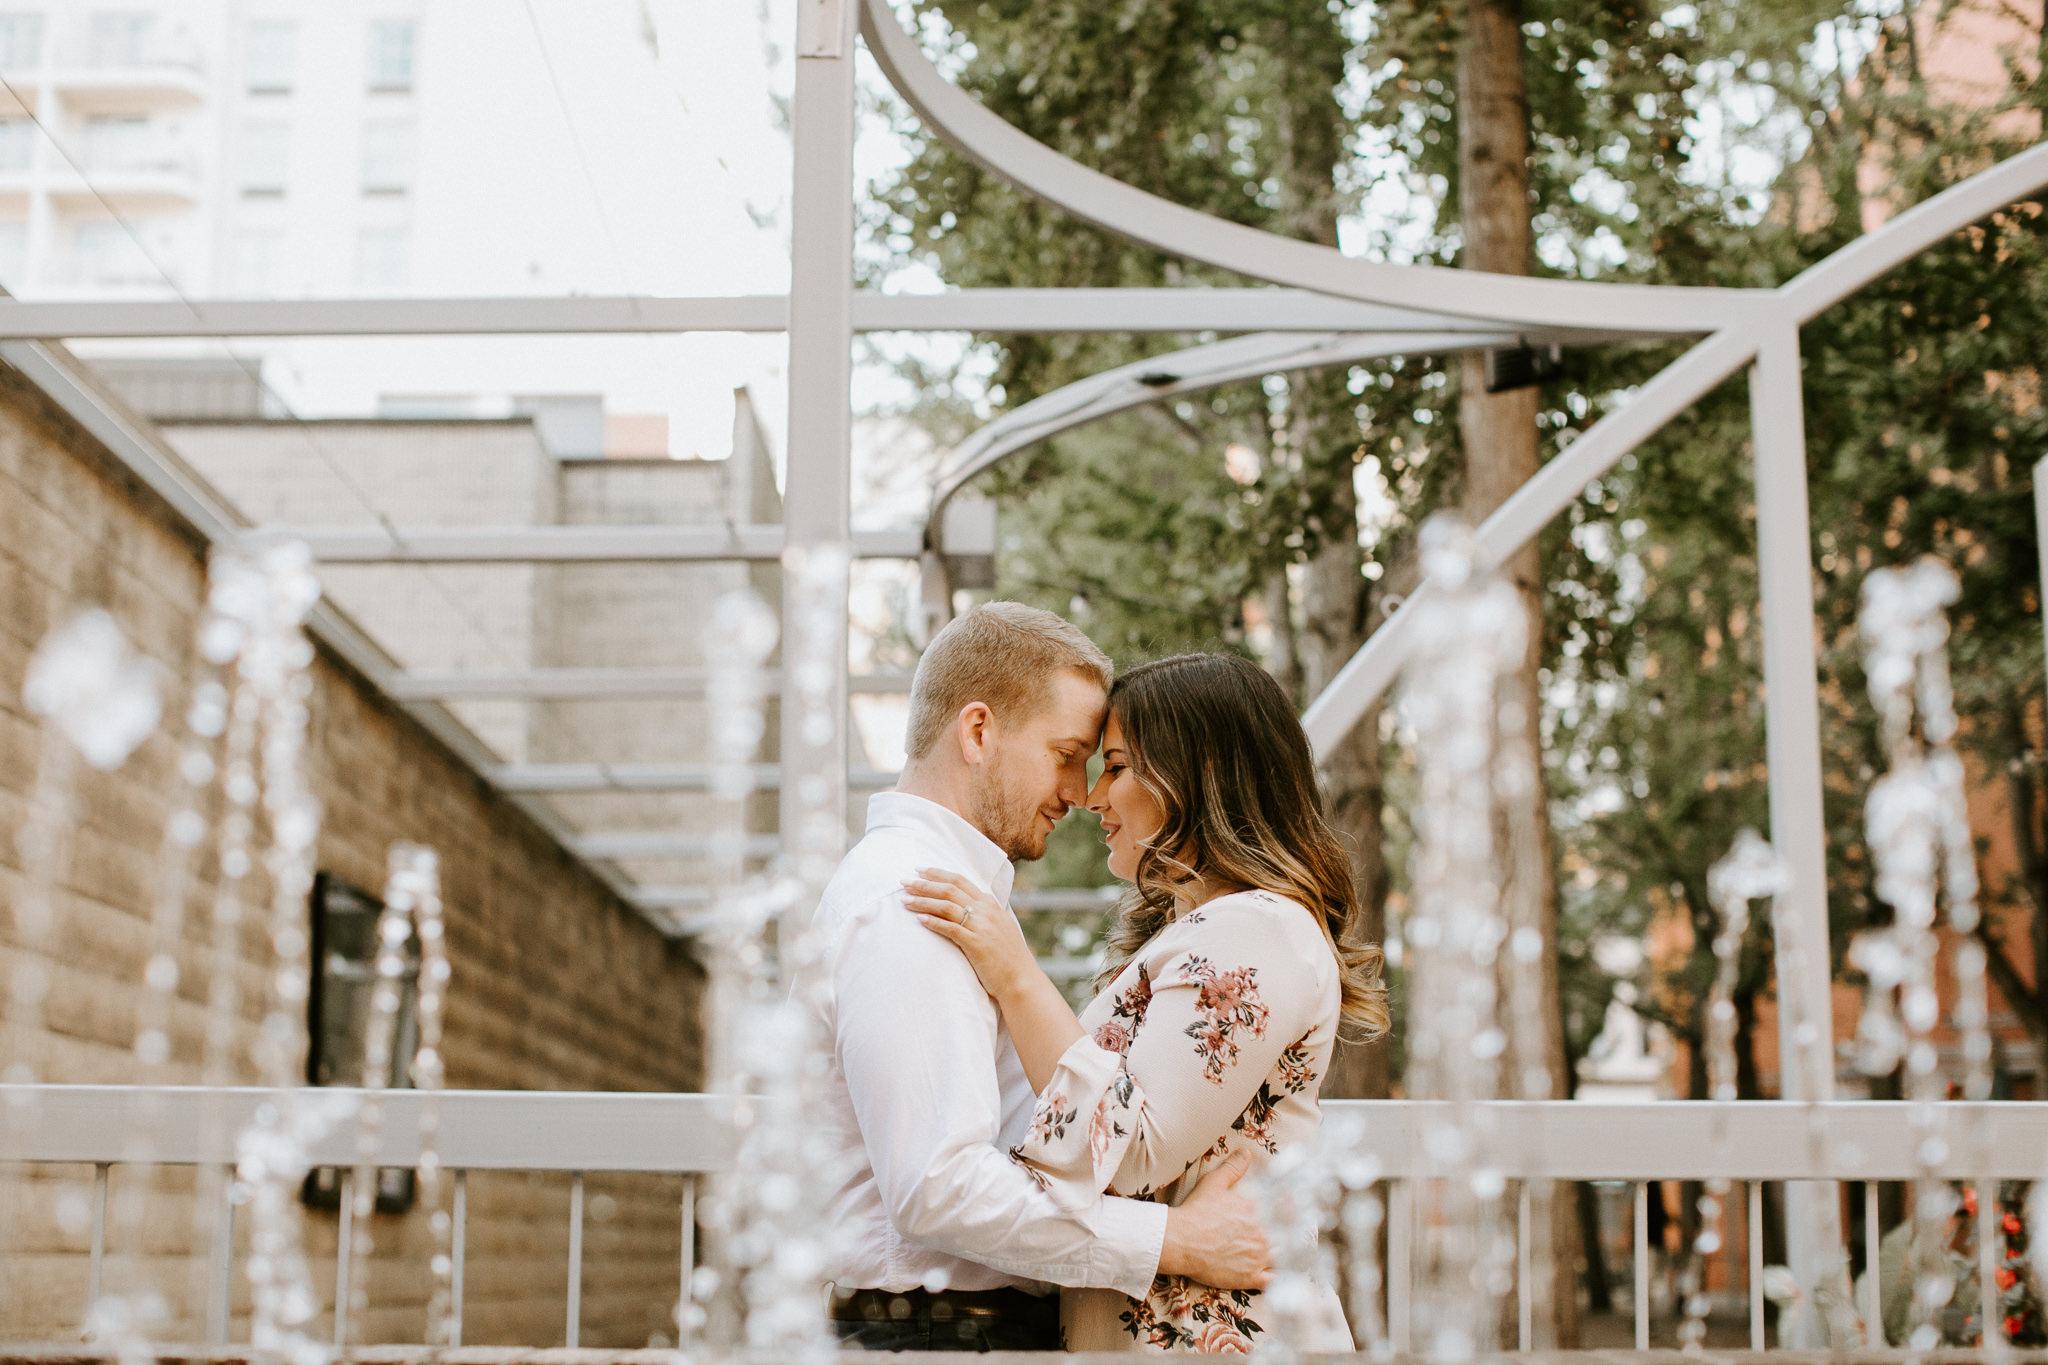 Engagement - Downtown Roanoke -  Wedding Photographer - Virginia - Best - Pat Cori Photography-14.jpg